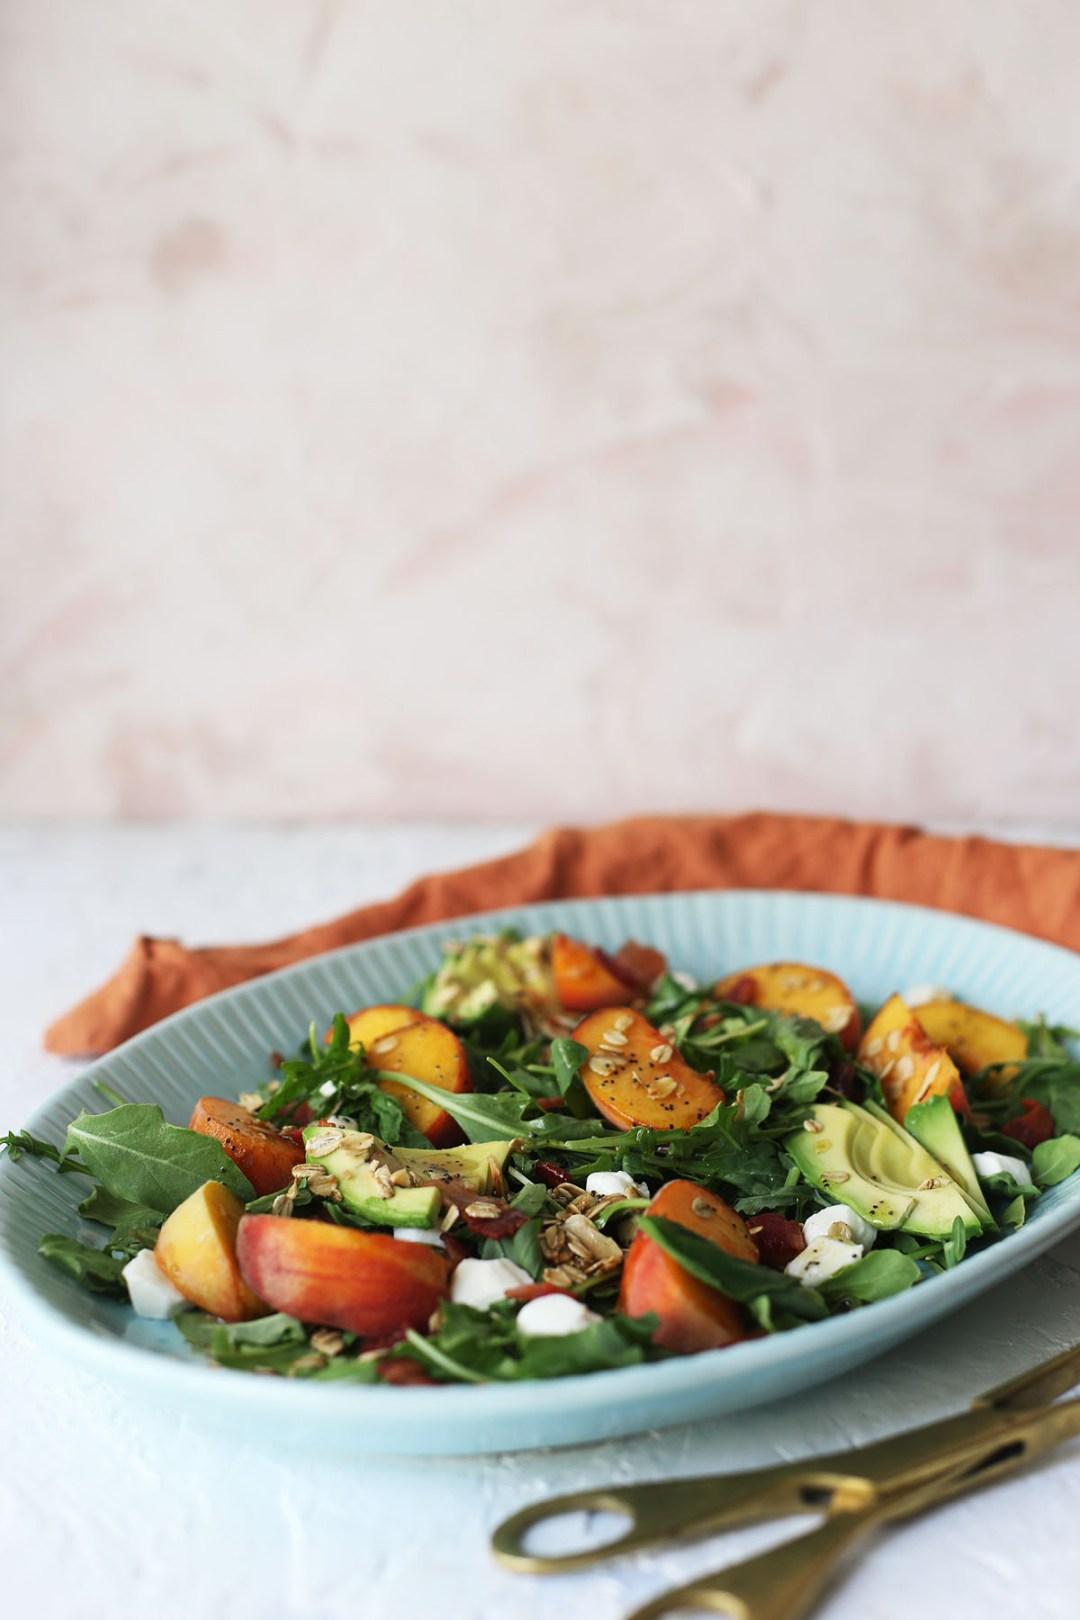 Arugula Peach and Crispy Bacon Salad with Maple Granola